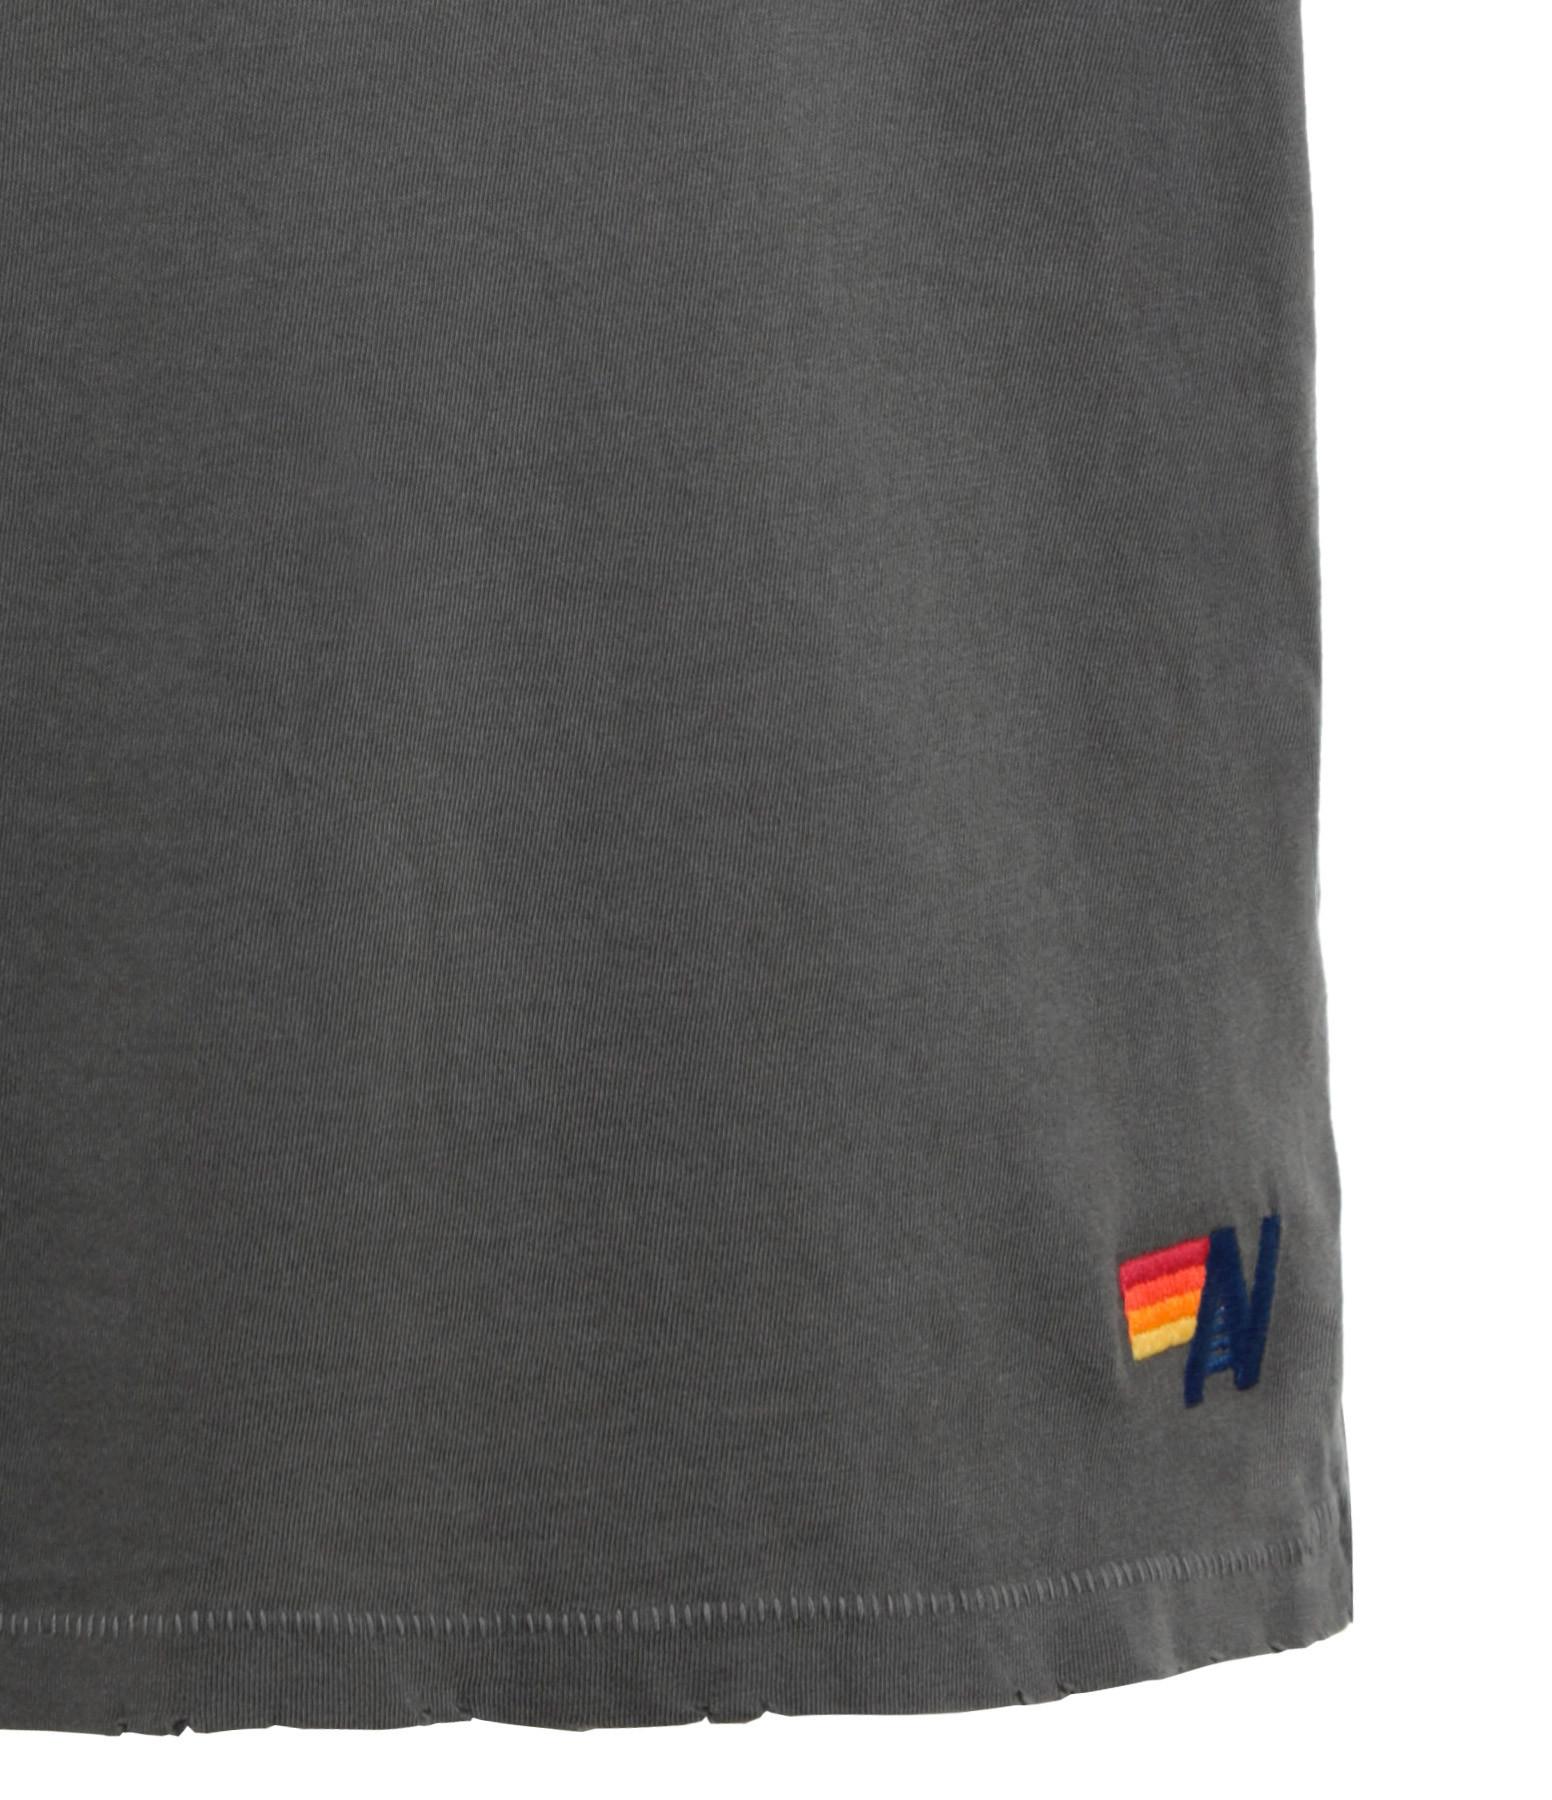 AVIATOR NATION - Tee-shirt Sunrise Charbon Vintage